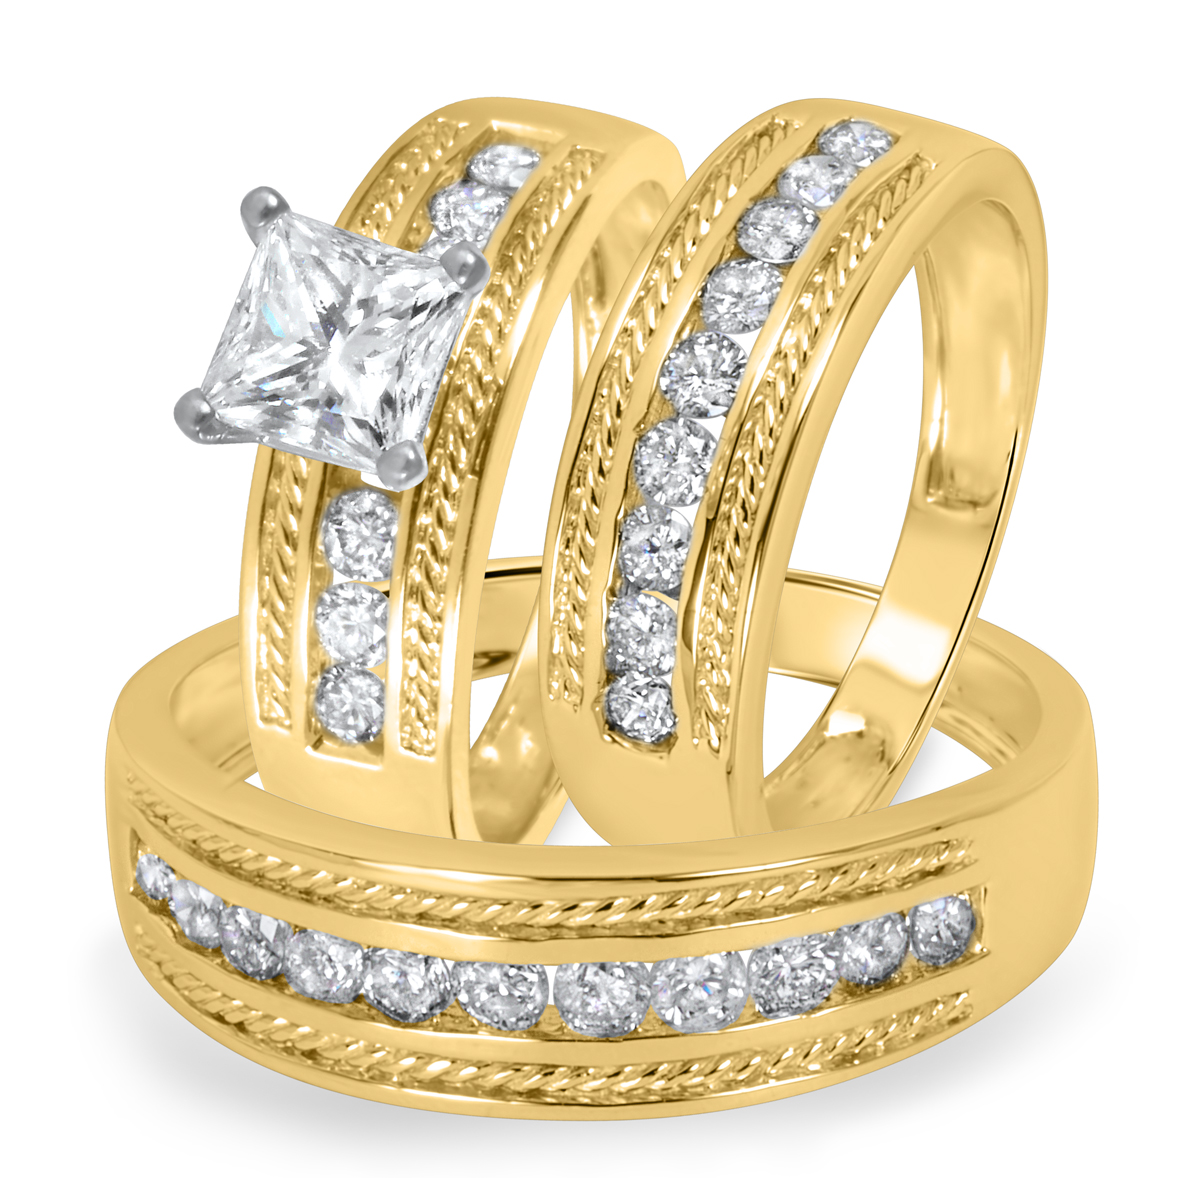 2 CT. T.W. Diamond Ladies Engagement Ring, Wedding Band, Men's Wedding Band